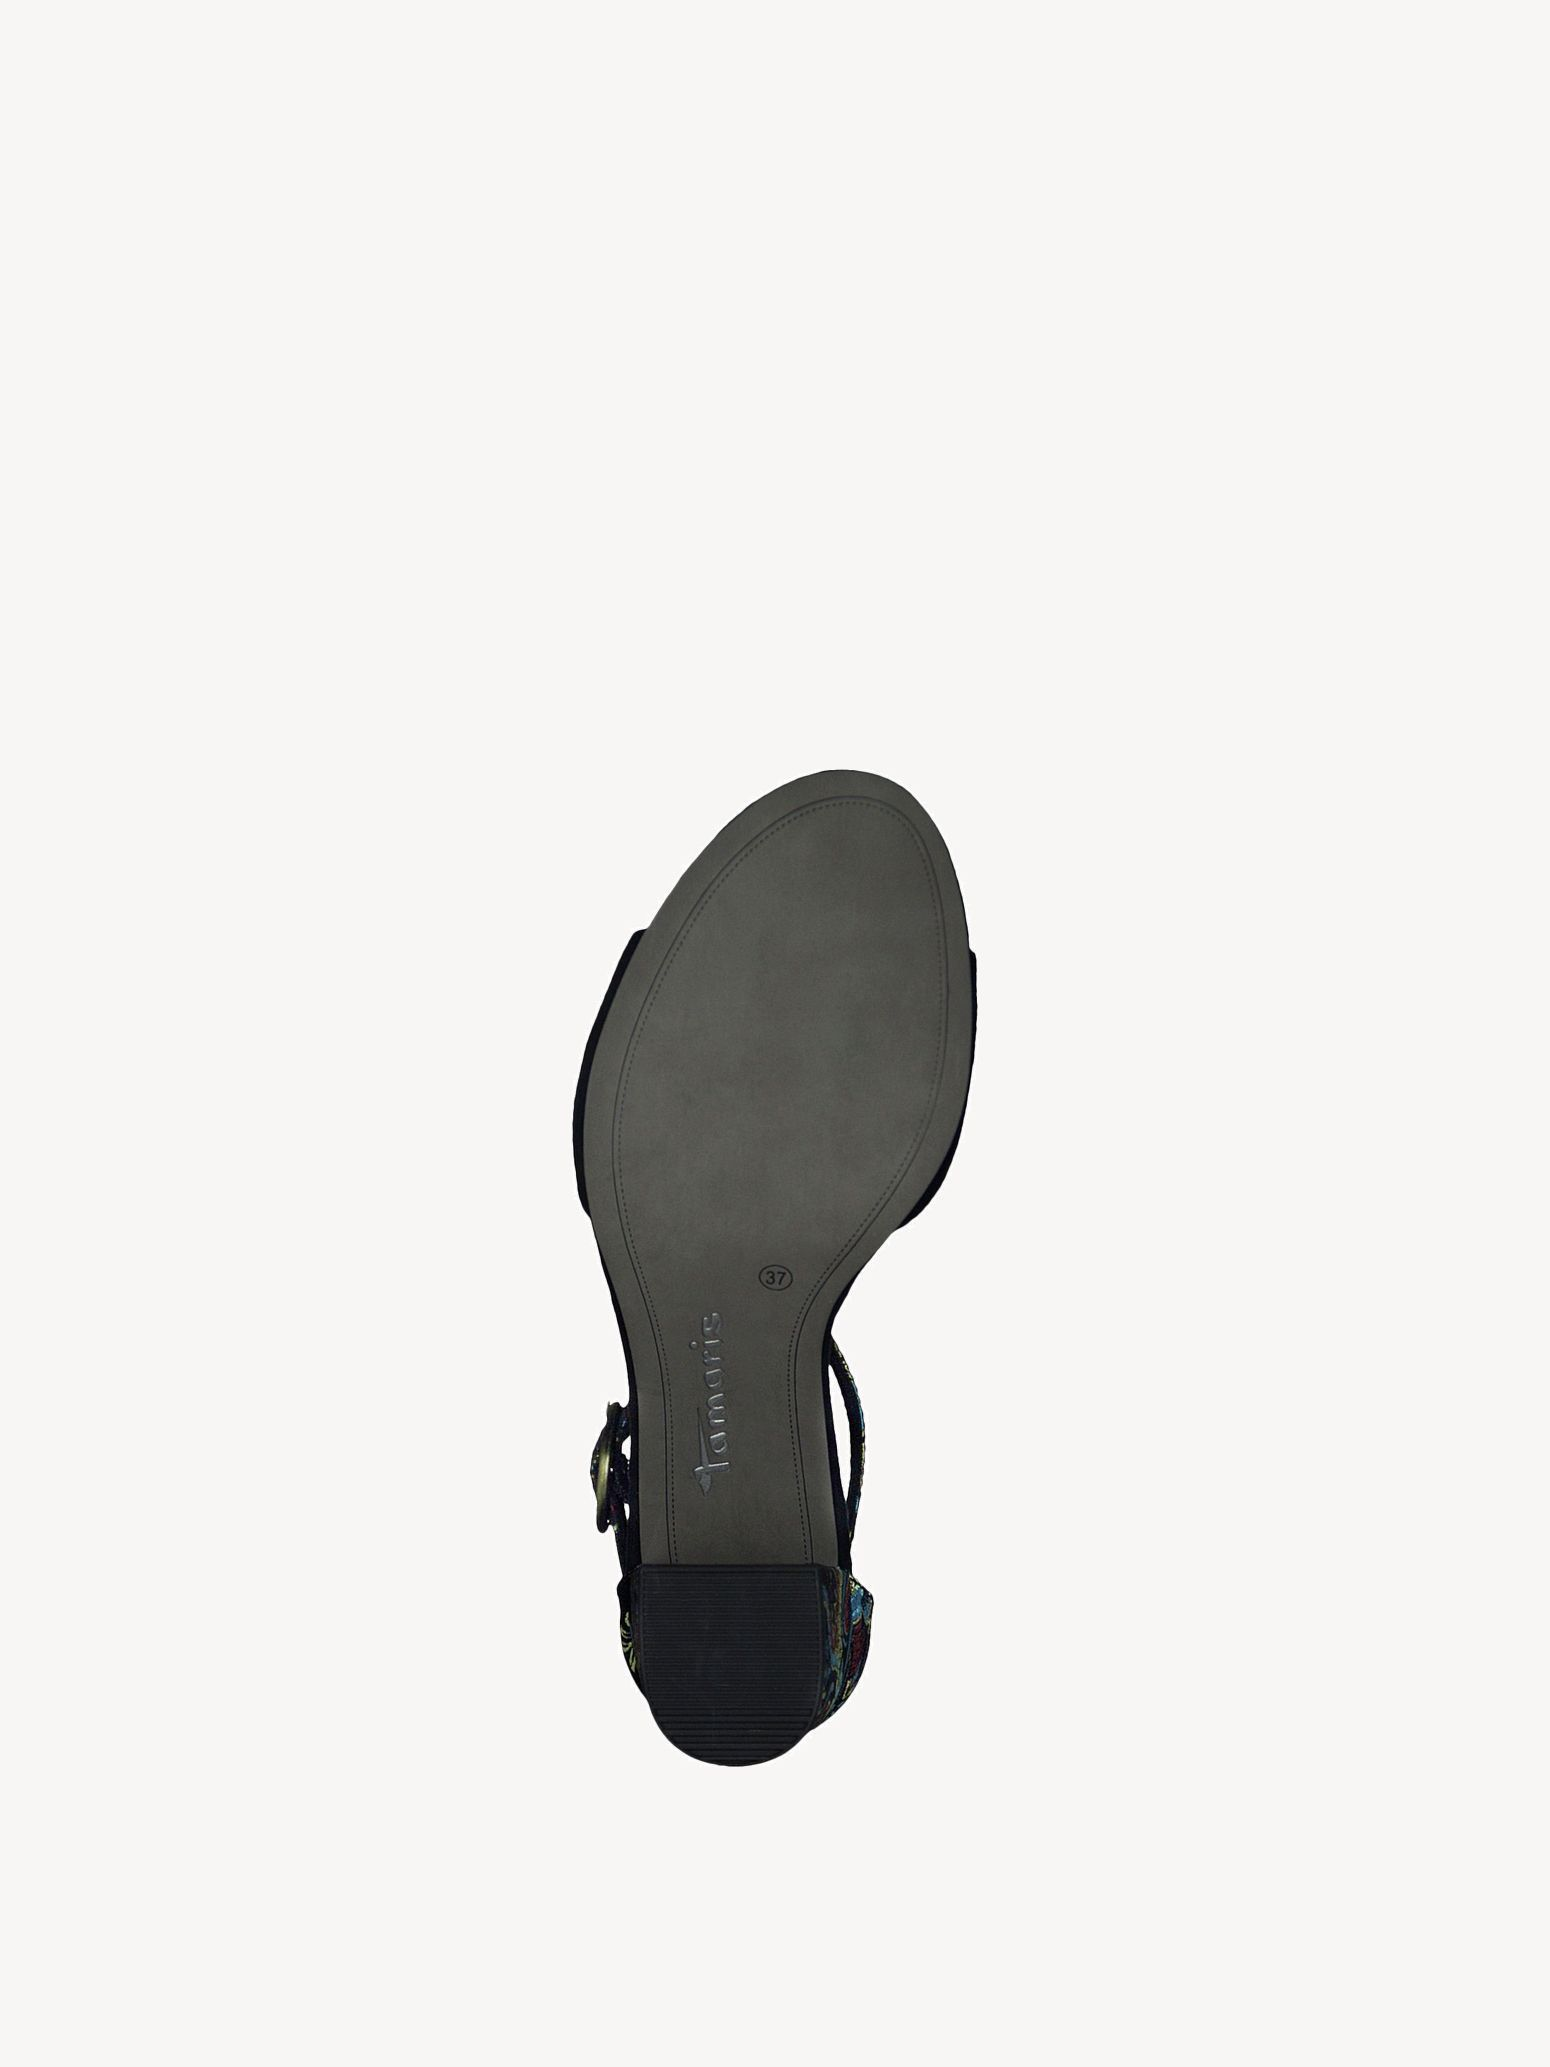 sandalette heiti tamaris black comb